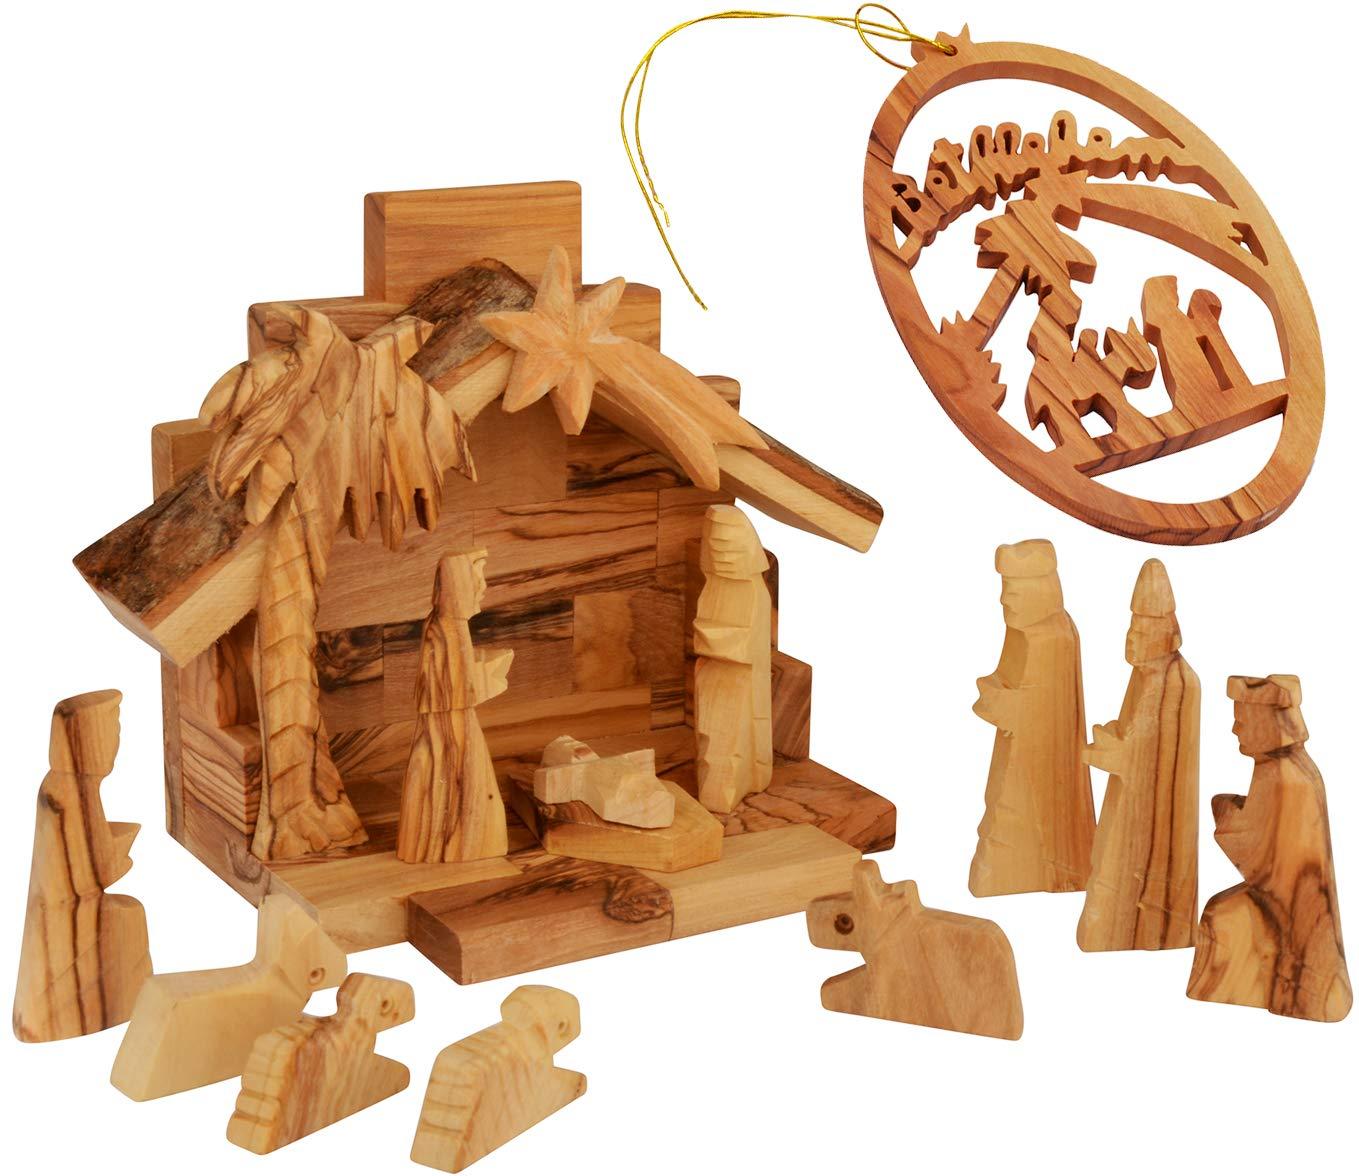 The Jerusalem Gift Shop Olive Wood Nativity Set with Olive Wood Figurines Made in Bethlehem - Including Christmas Tree Decoration